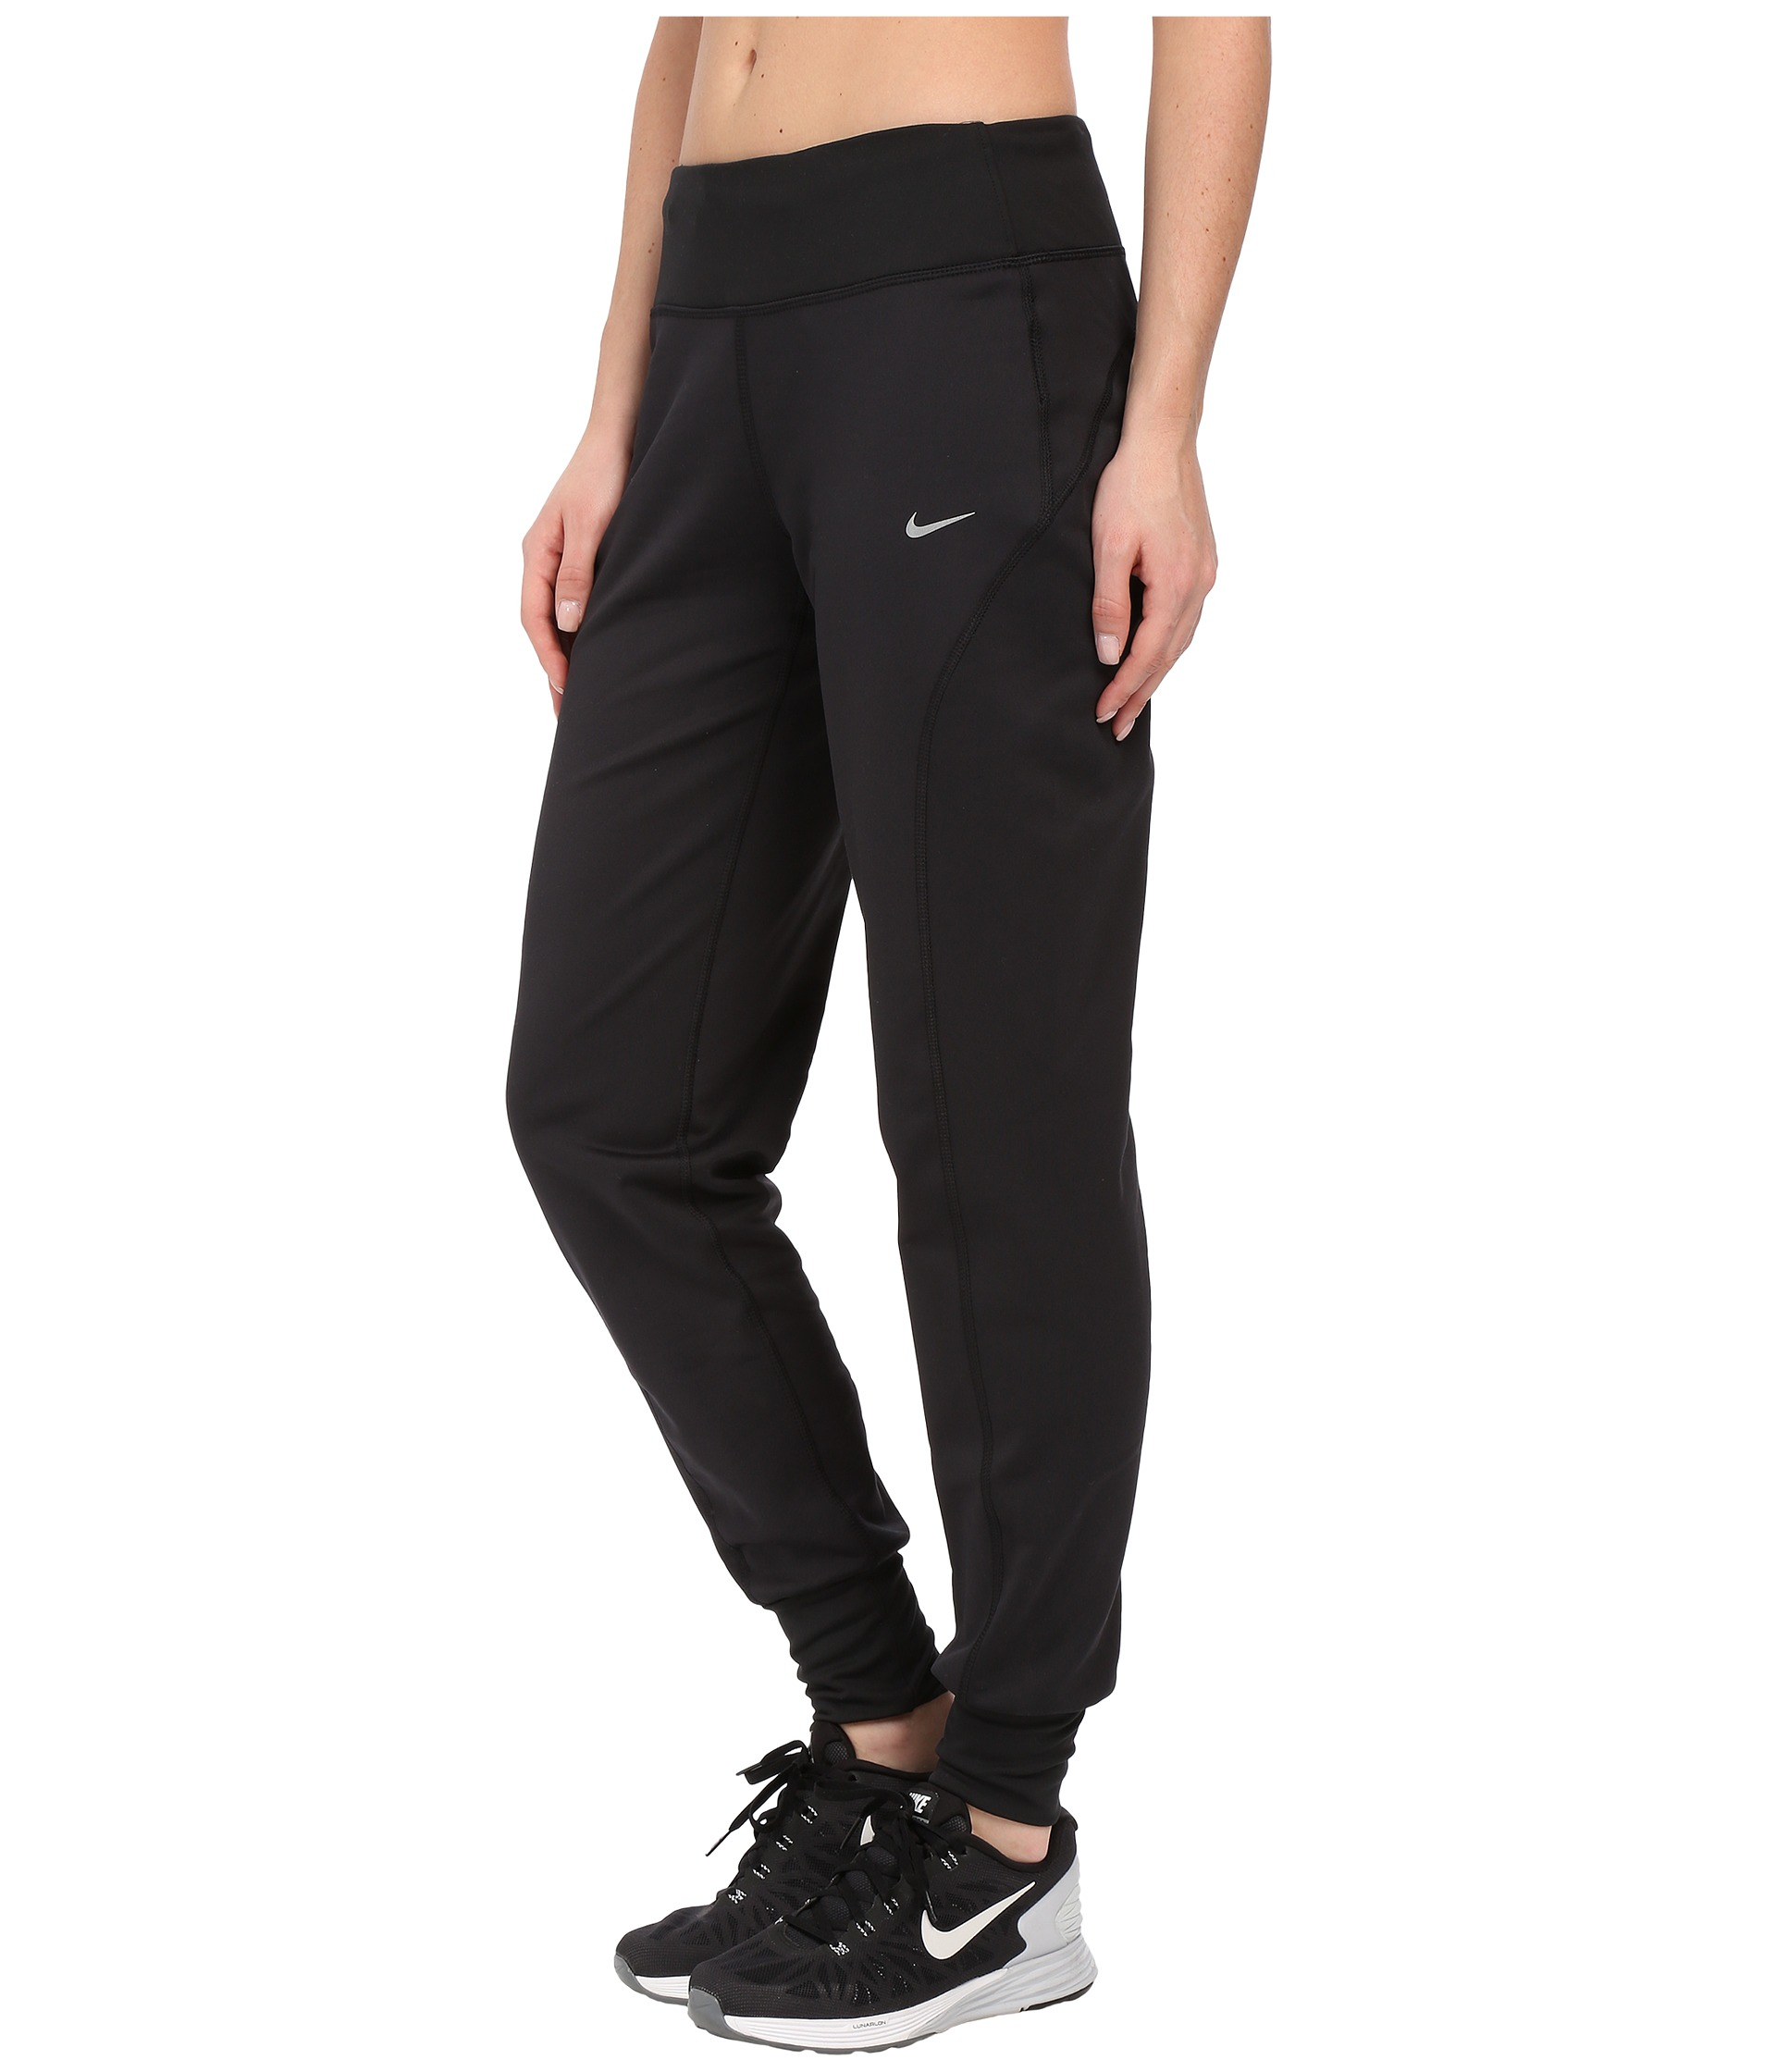 Lyst - Nike Thermal Running Pant in Black